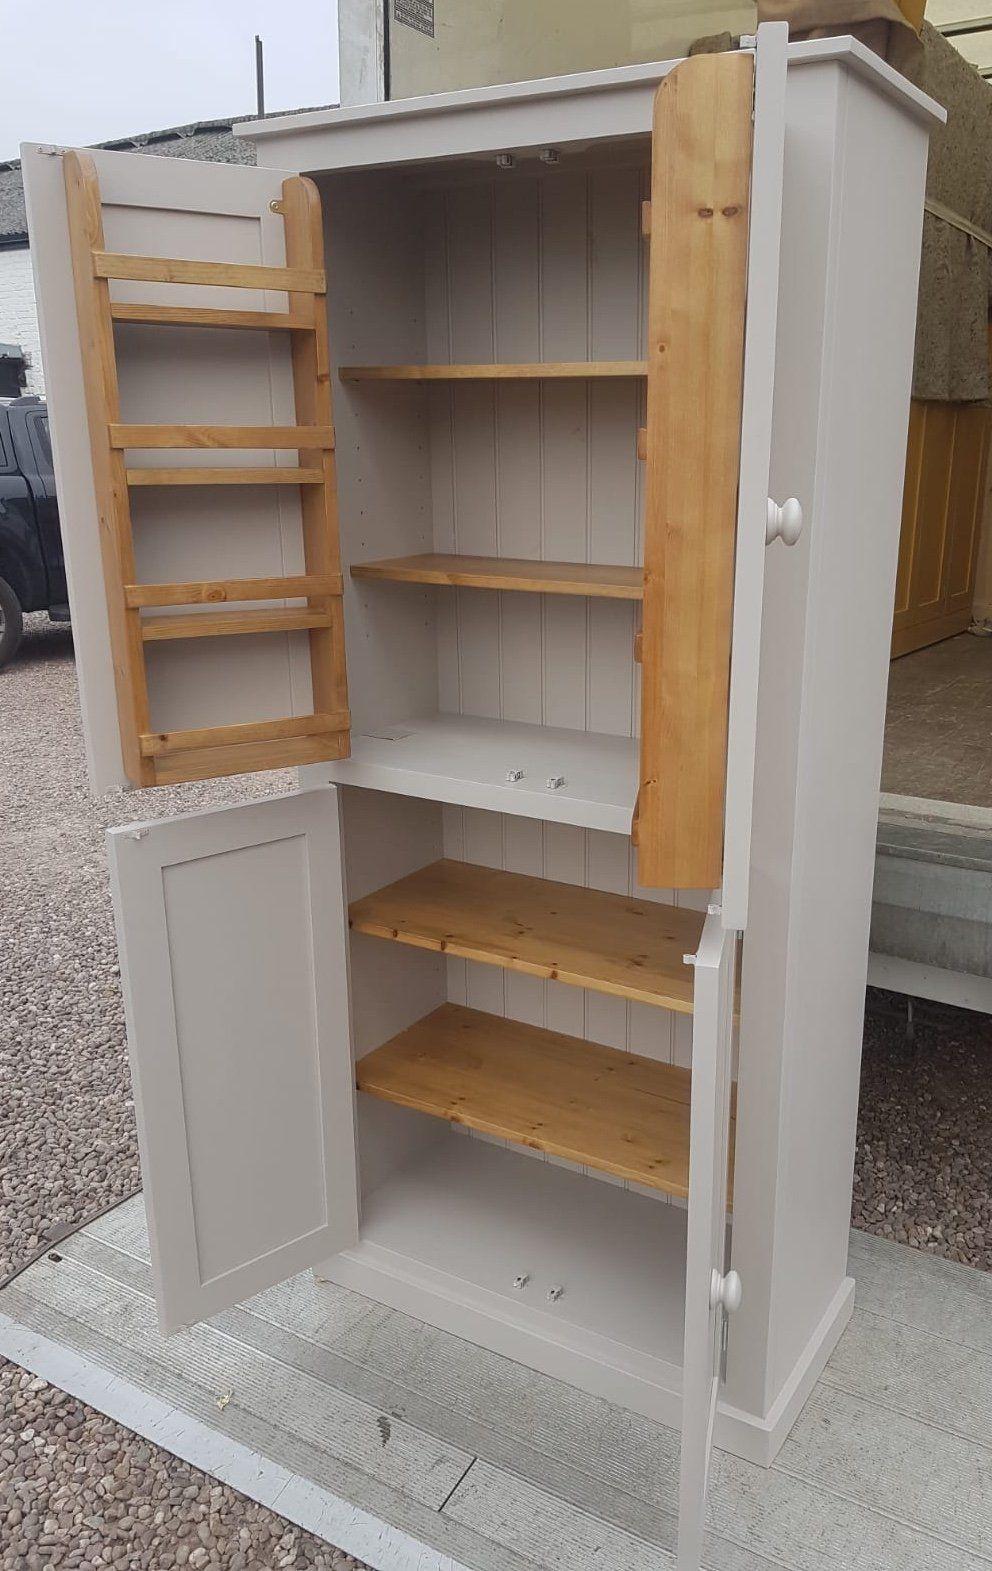 Larder Pantry Kitchen Utility Cupboard With Spice Racks 2 Door Over 2 Door Storage In 2020 Kitchen Cupboard Designs Kitchen Pantry Cabinets Kitchen Pantry Storage